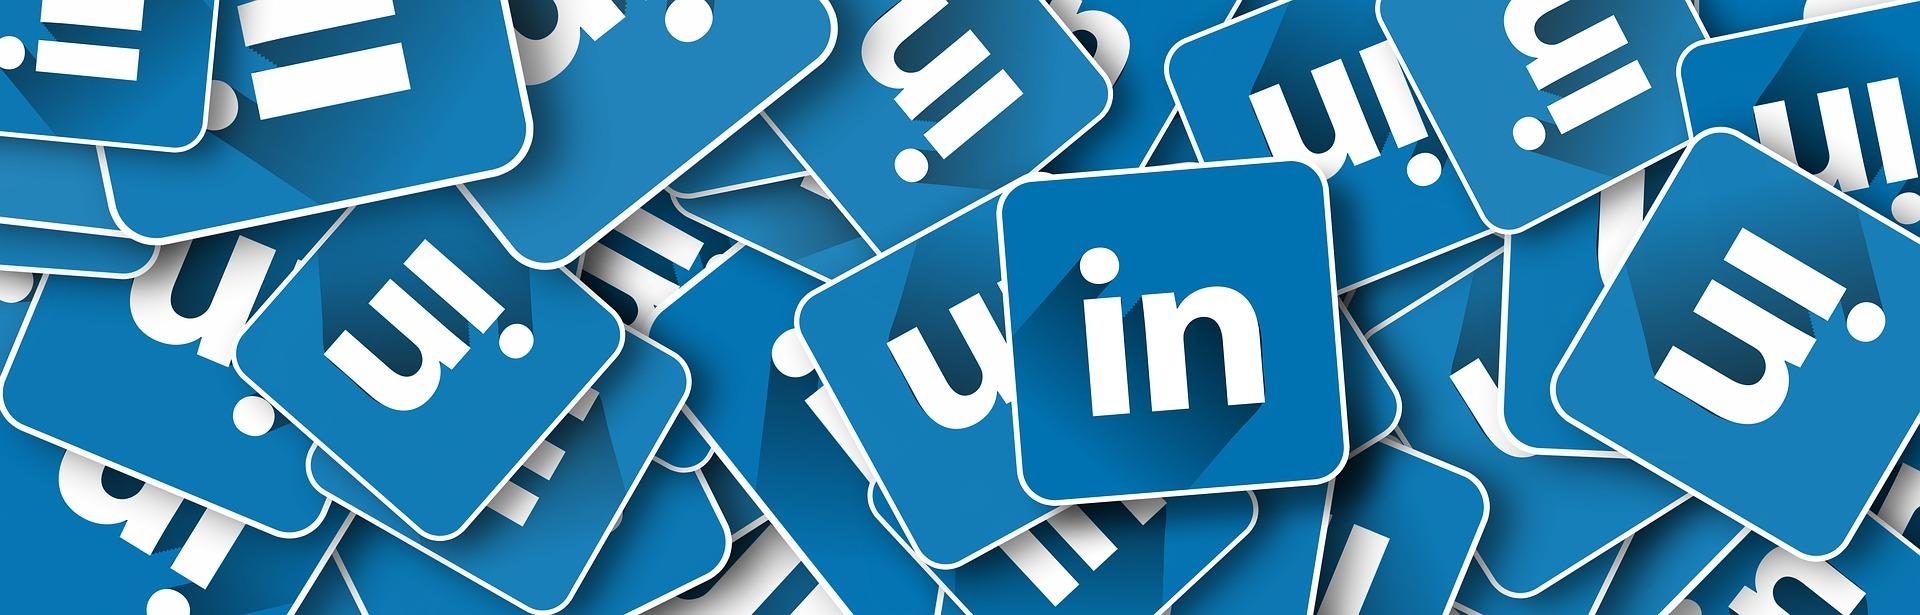 LinkedIn, Linkedin marketing, connecting on linkedin